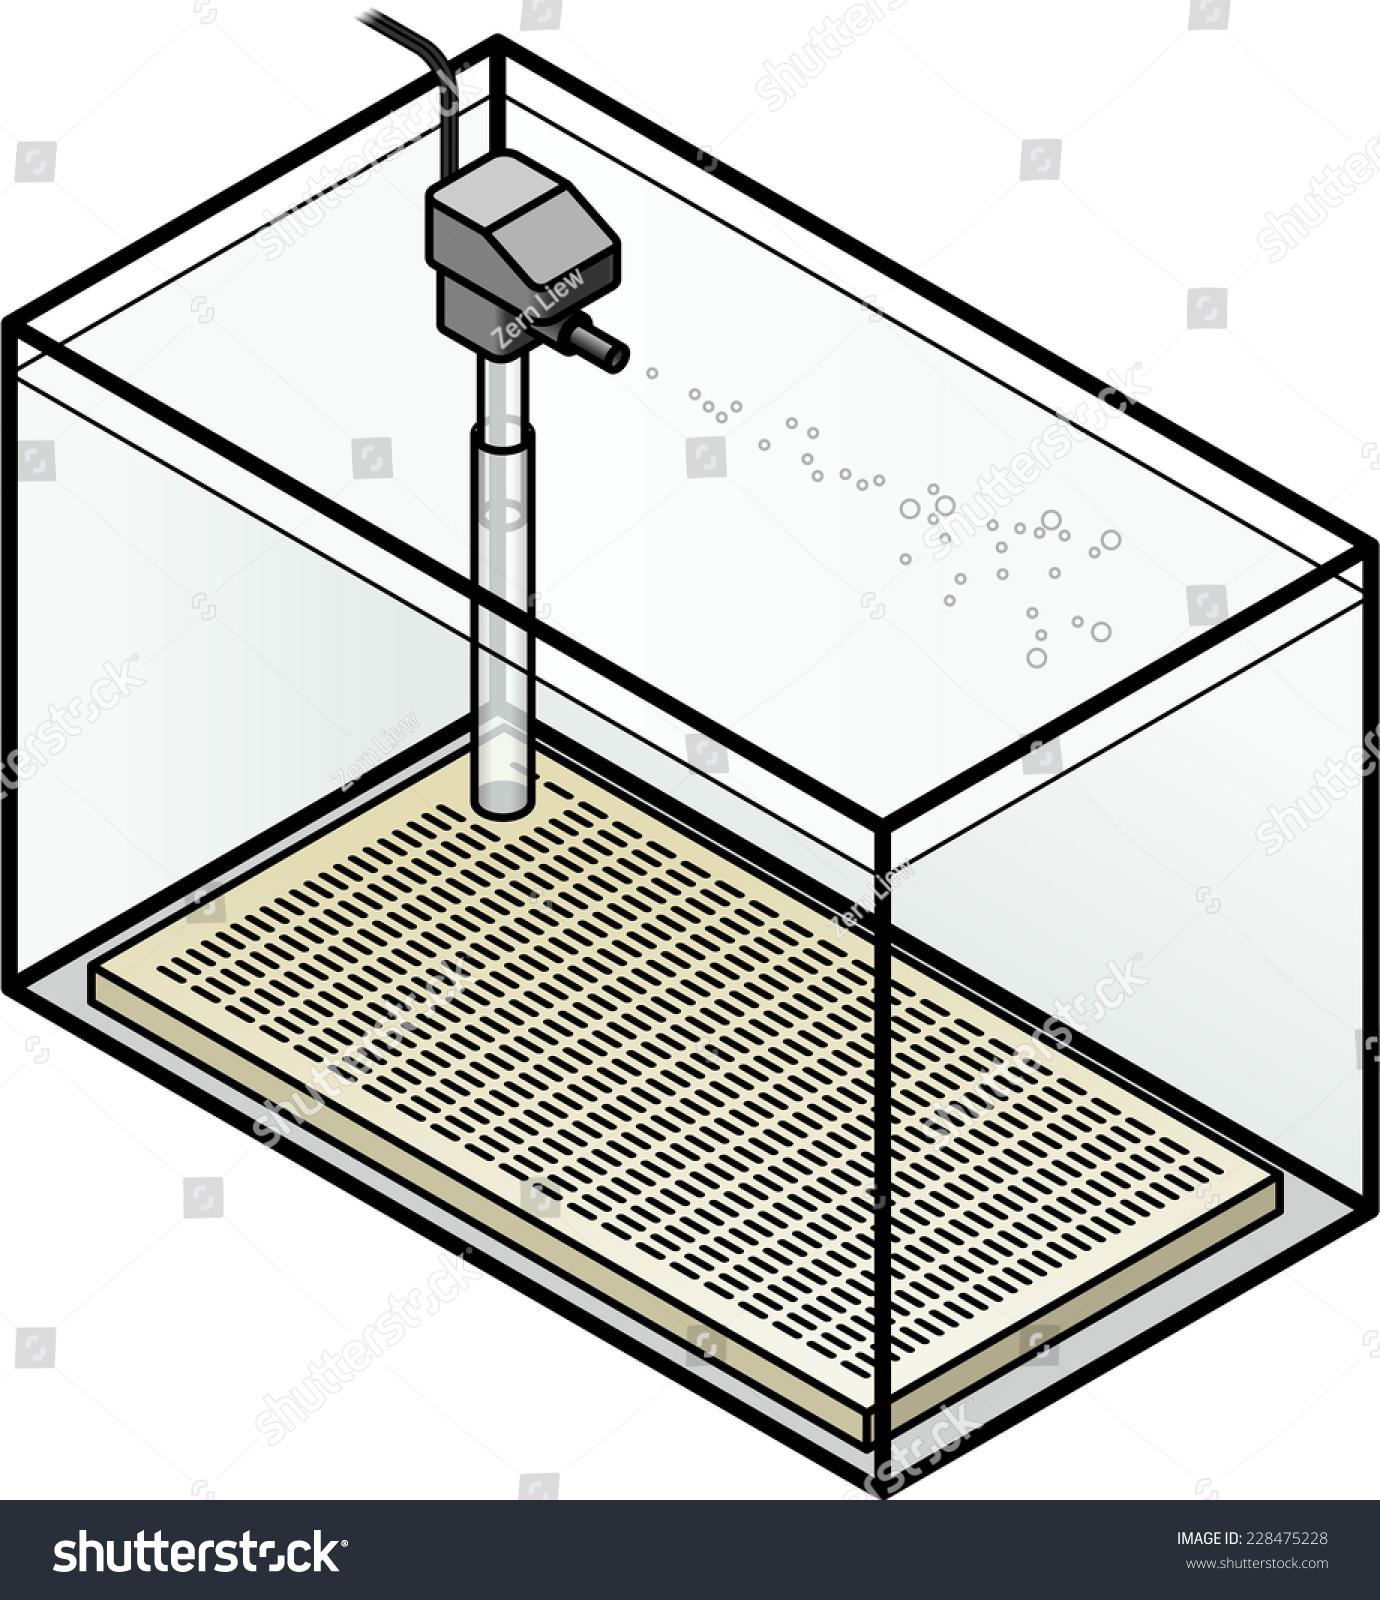 hight resolution of an aquarium filter under gravel filter with a power head